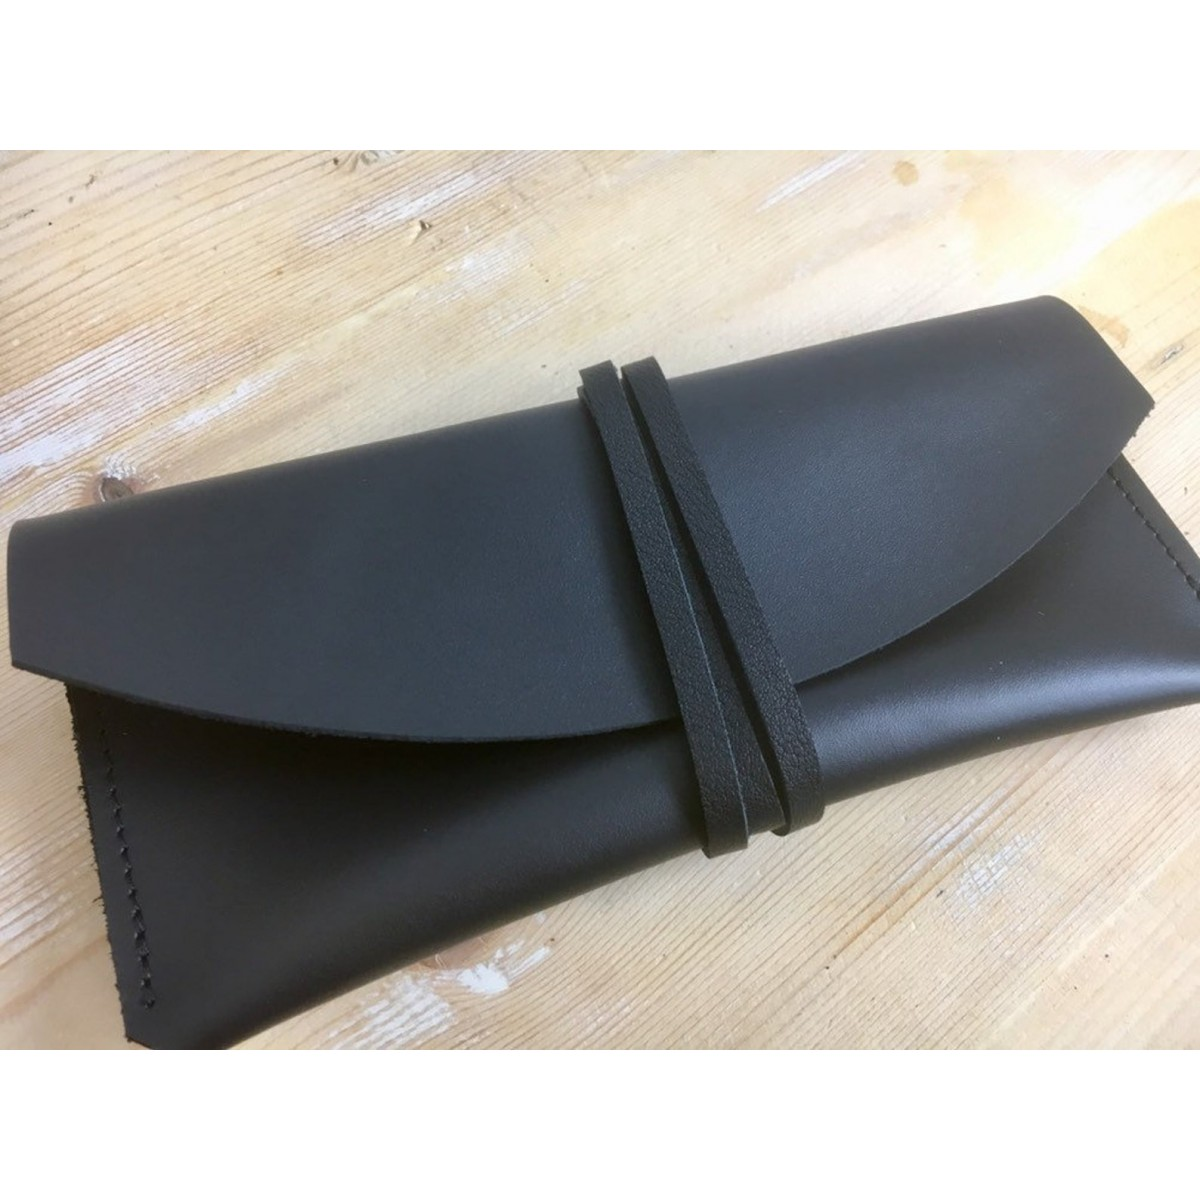 BSaite / Leder Brillenetui / Leder Etui / Sonnenbrillen Etui / Leder Clutch / glasses case / minimal